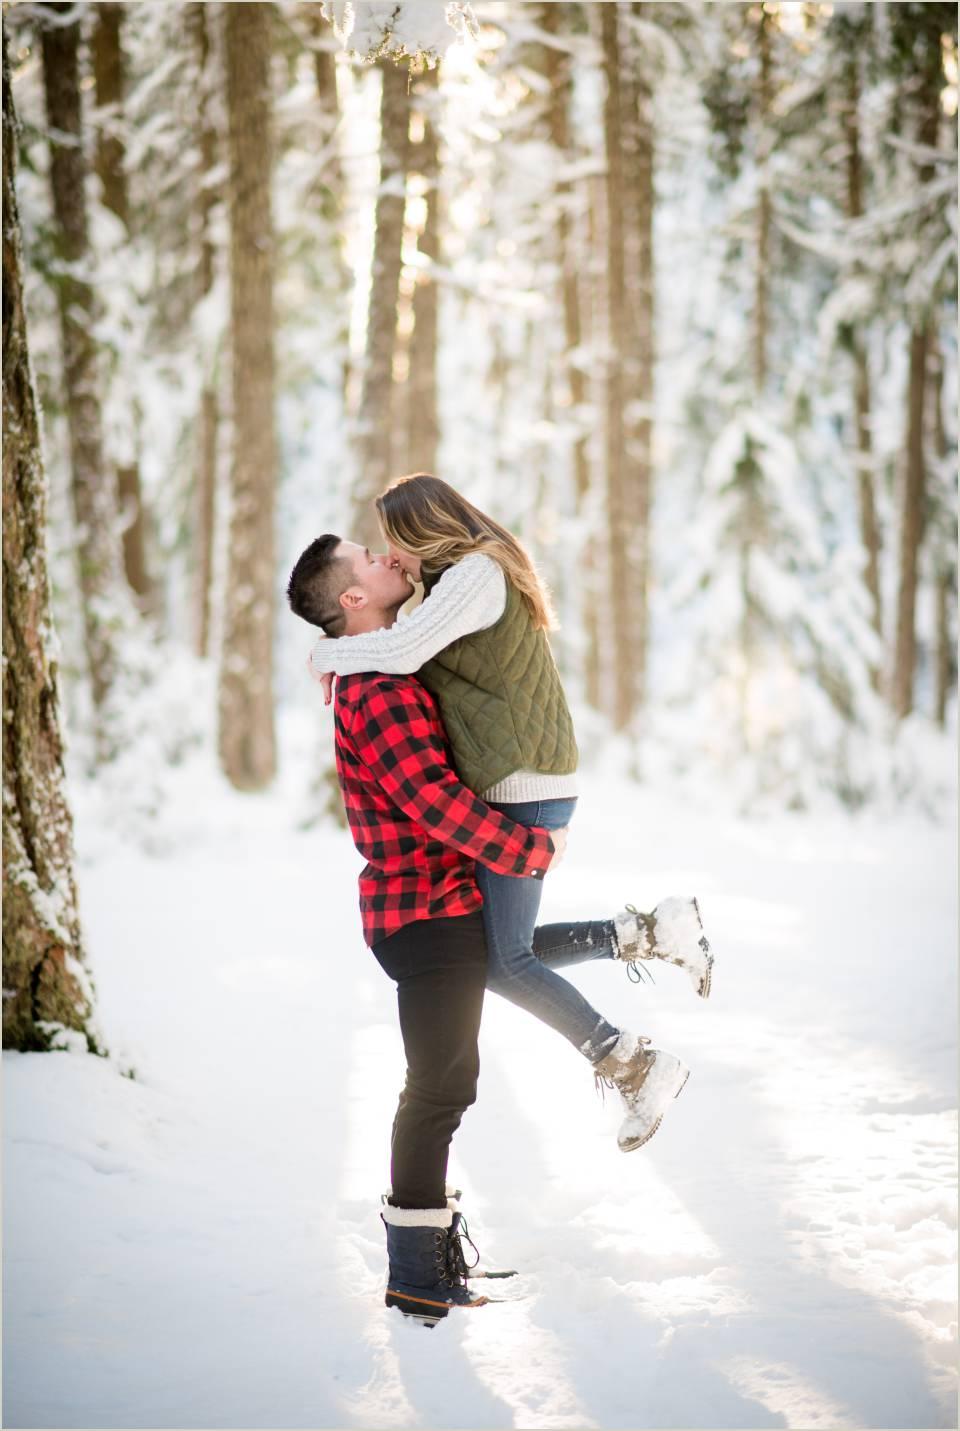 couple love winter wonderland